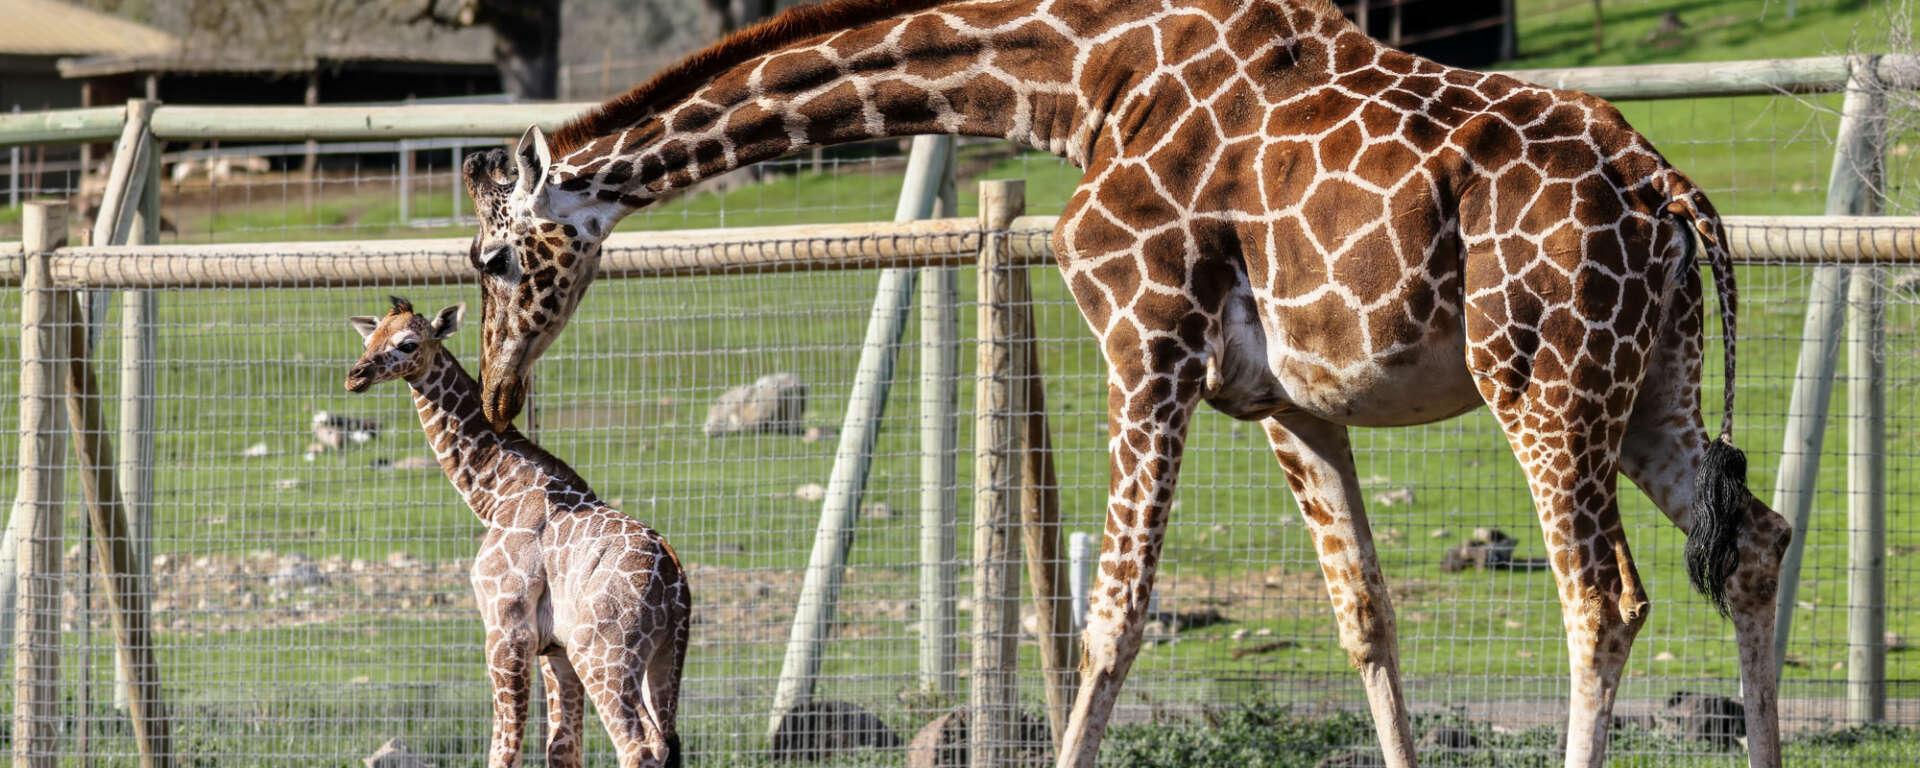 giraffe baby and mom